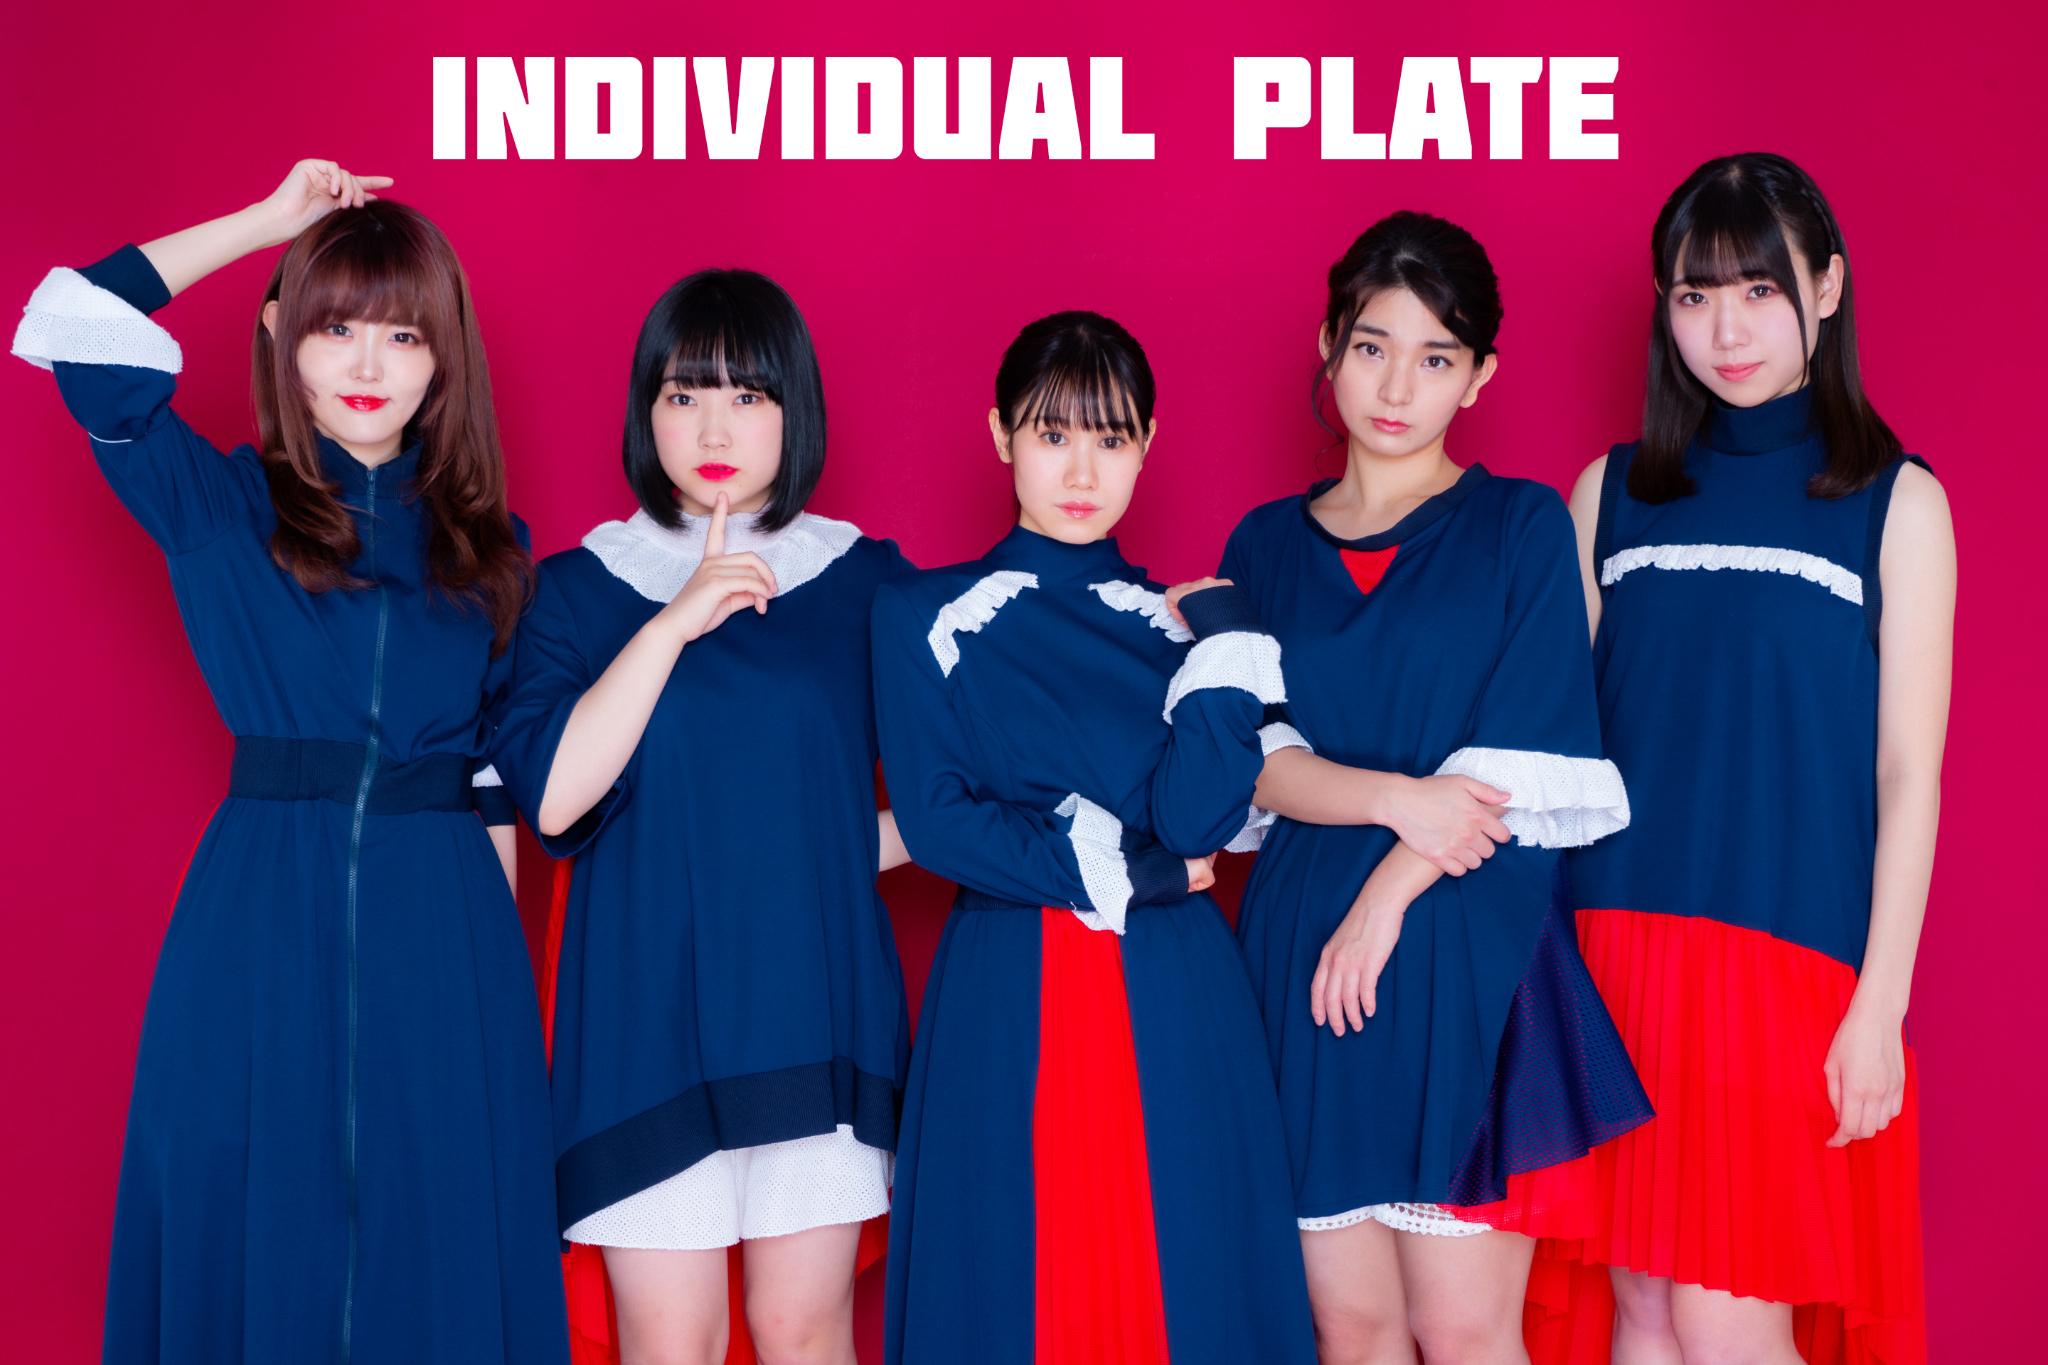 INDIVIDUAL PLATE